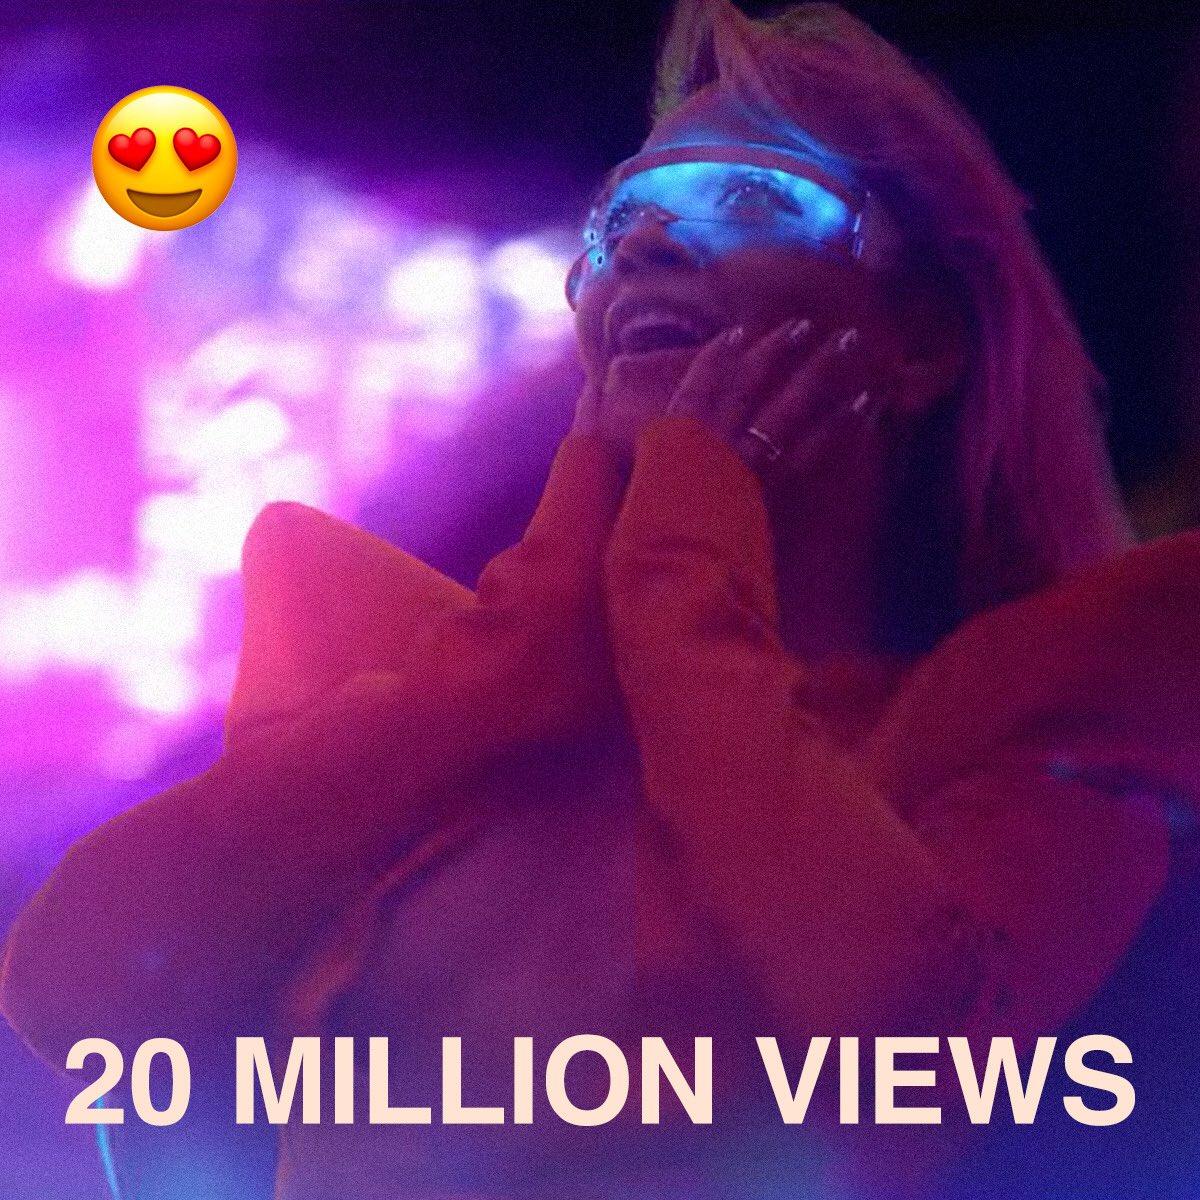 My face when I saw #GIRLSVideo hit 20 million views! Thank you! https://t.co/i2moE0MXjN https://t.co/sZ0dB2IlDq